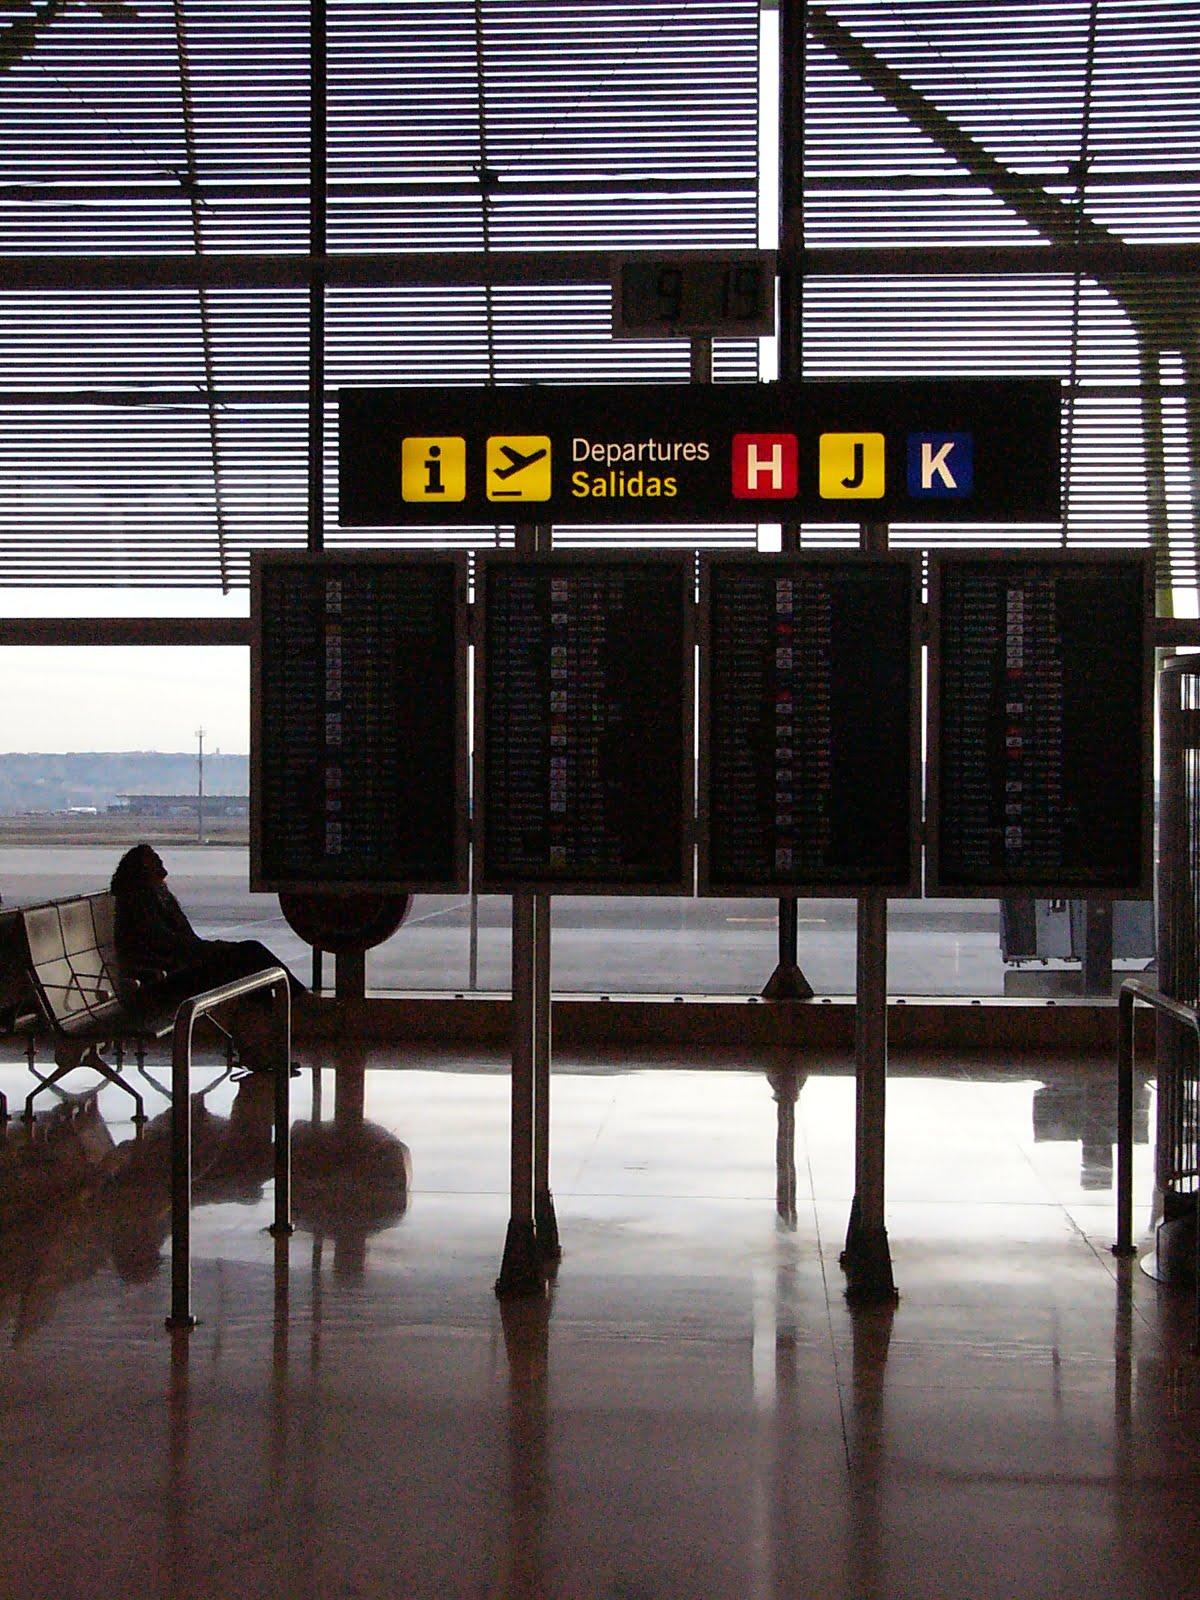 aeroport madrid panneau horaires